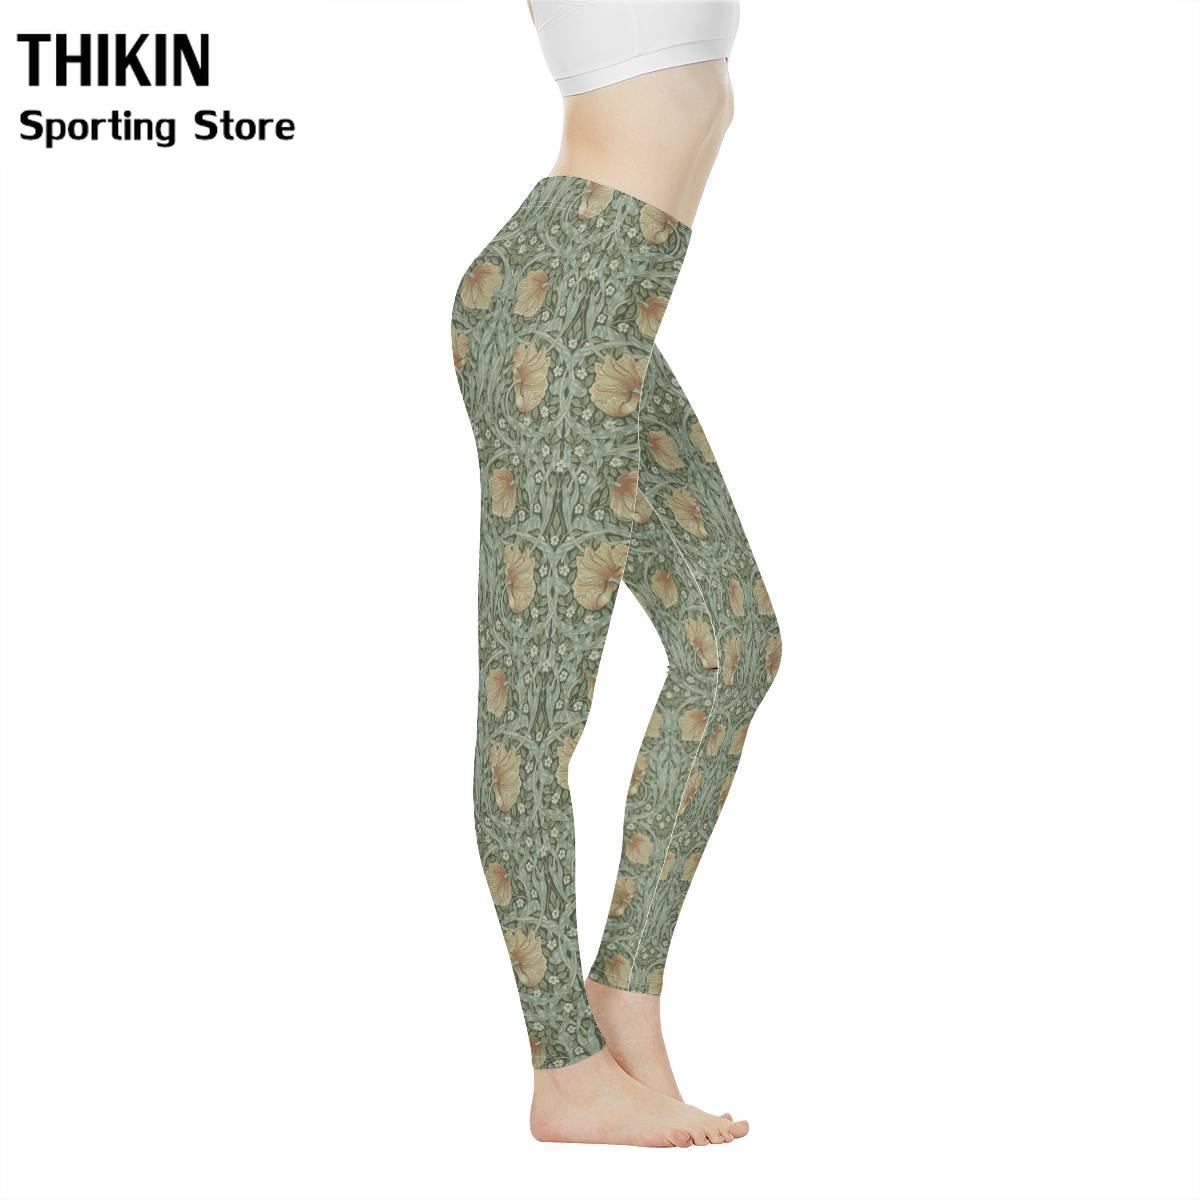 THIKIN Vintage Leggins Sport Women Fitness Legins Pants William Morris Pimpernel Print Seamless Leggings For Sportswear Leginss